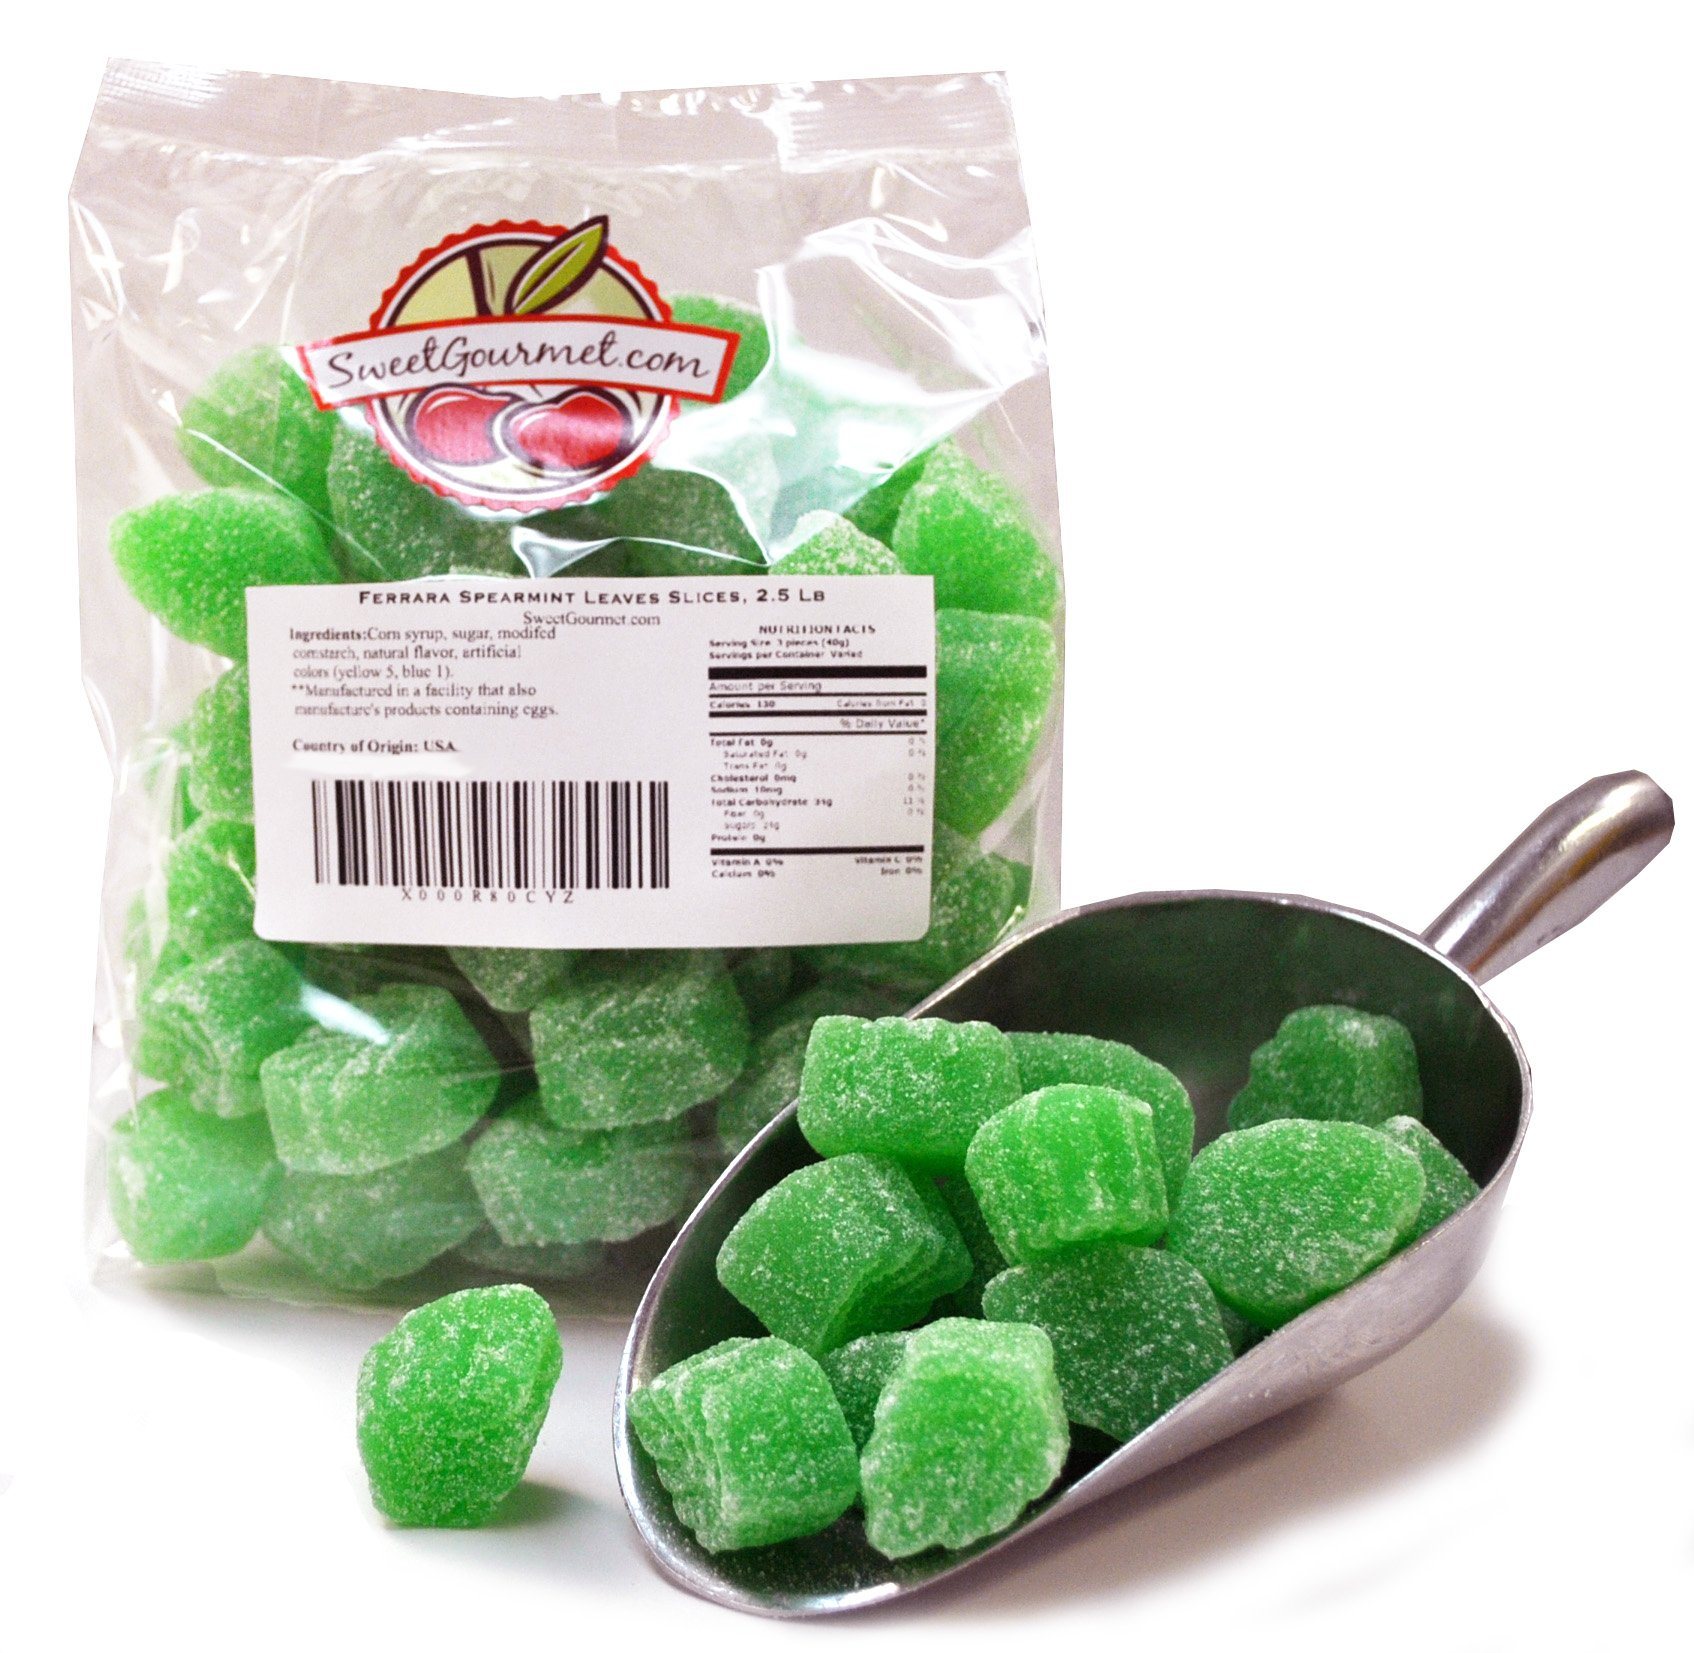 Ferrara Candy Spearmint Leaves jelly candy (2.5Lb)